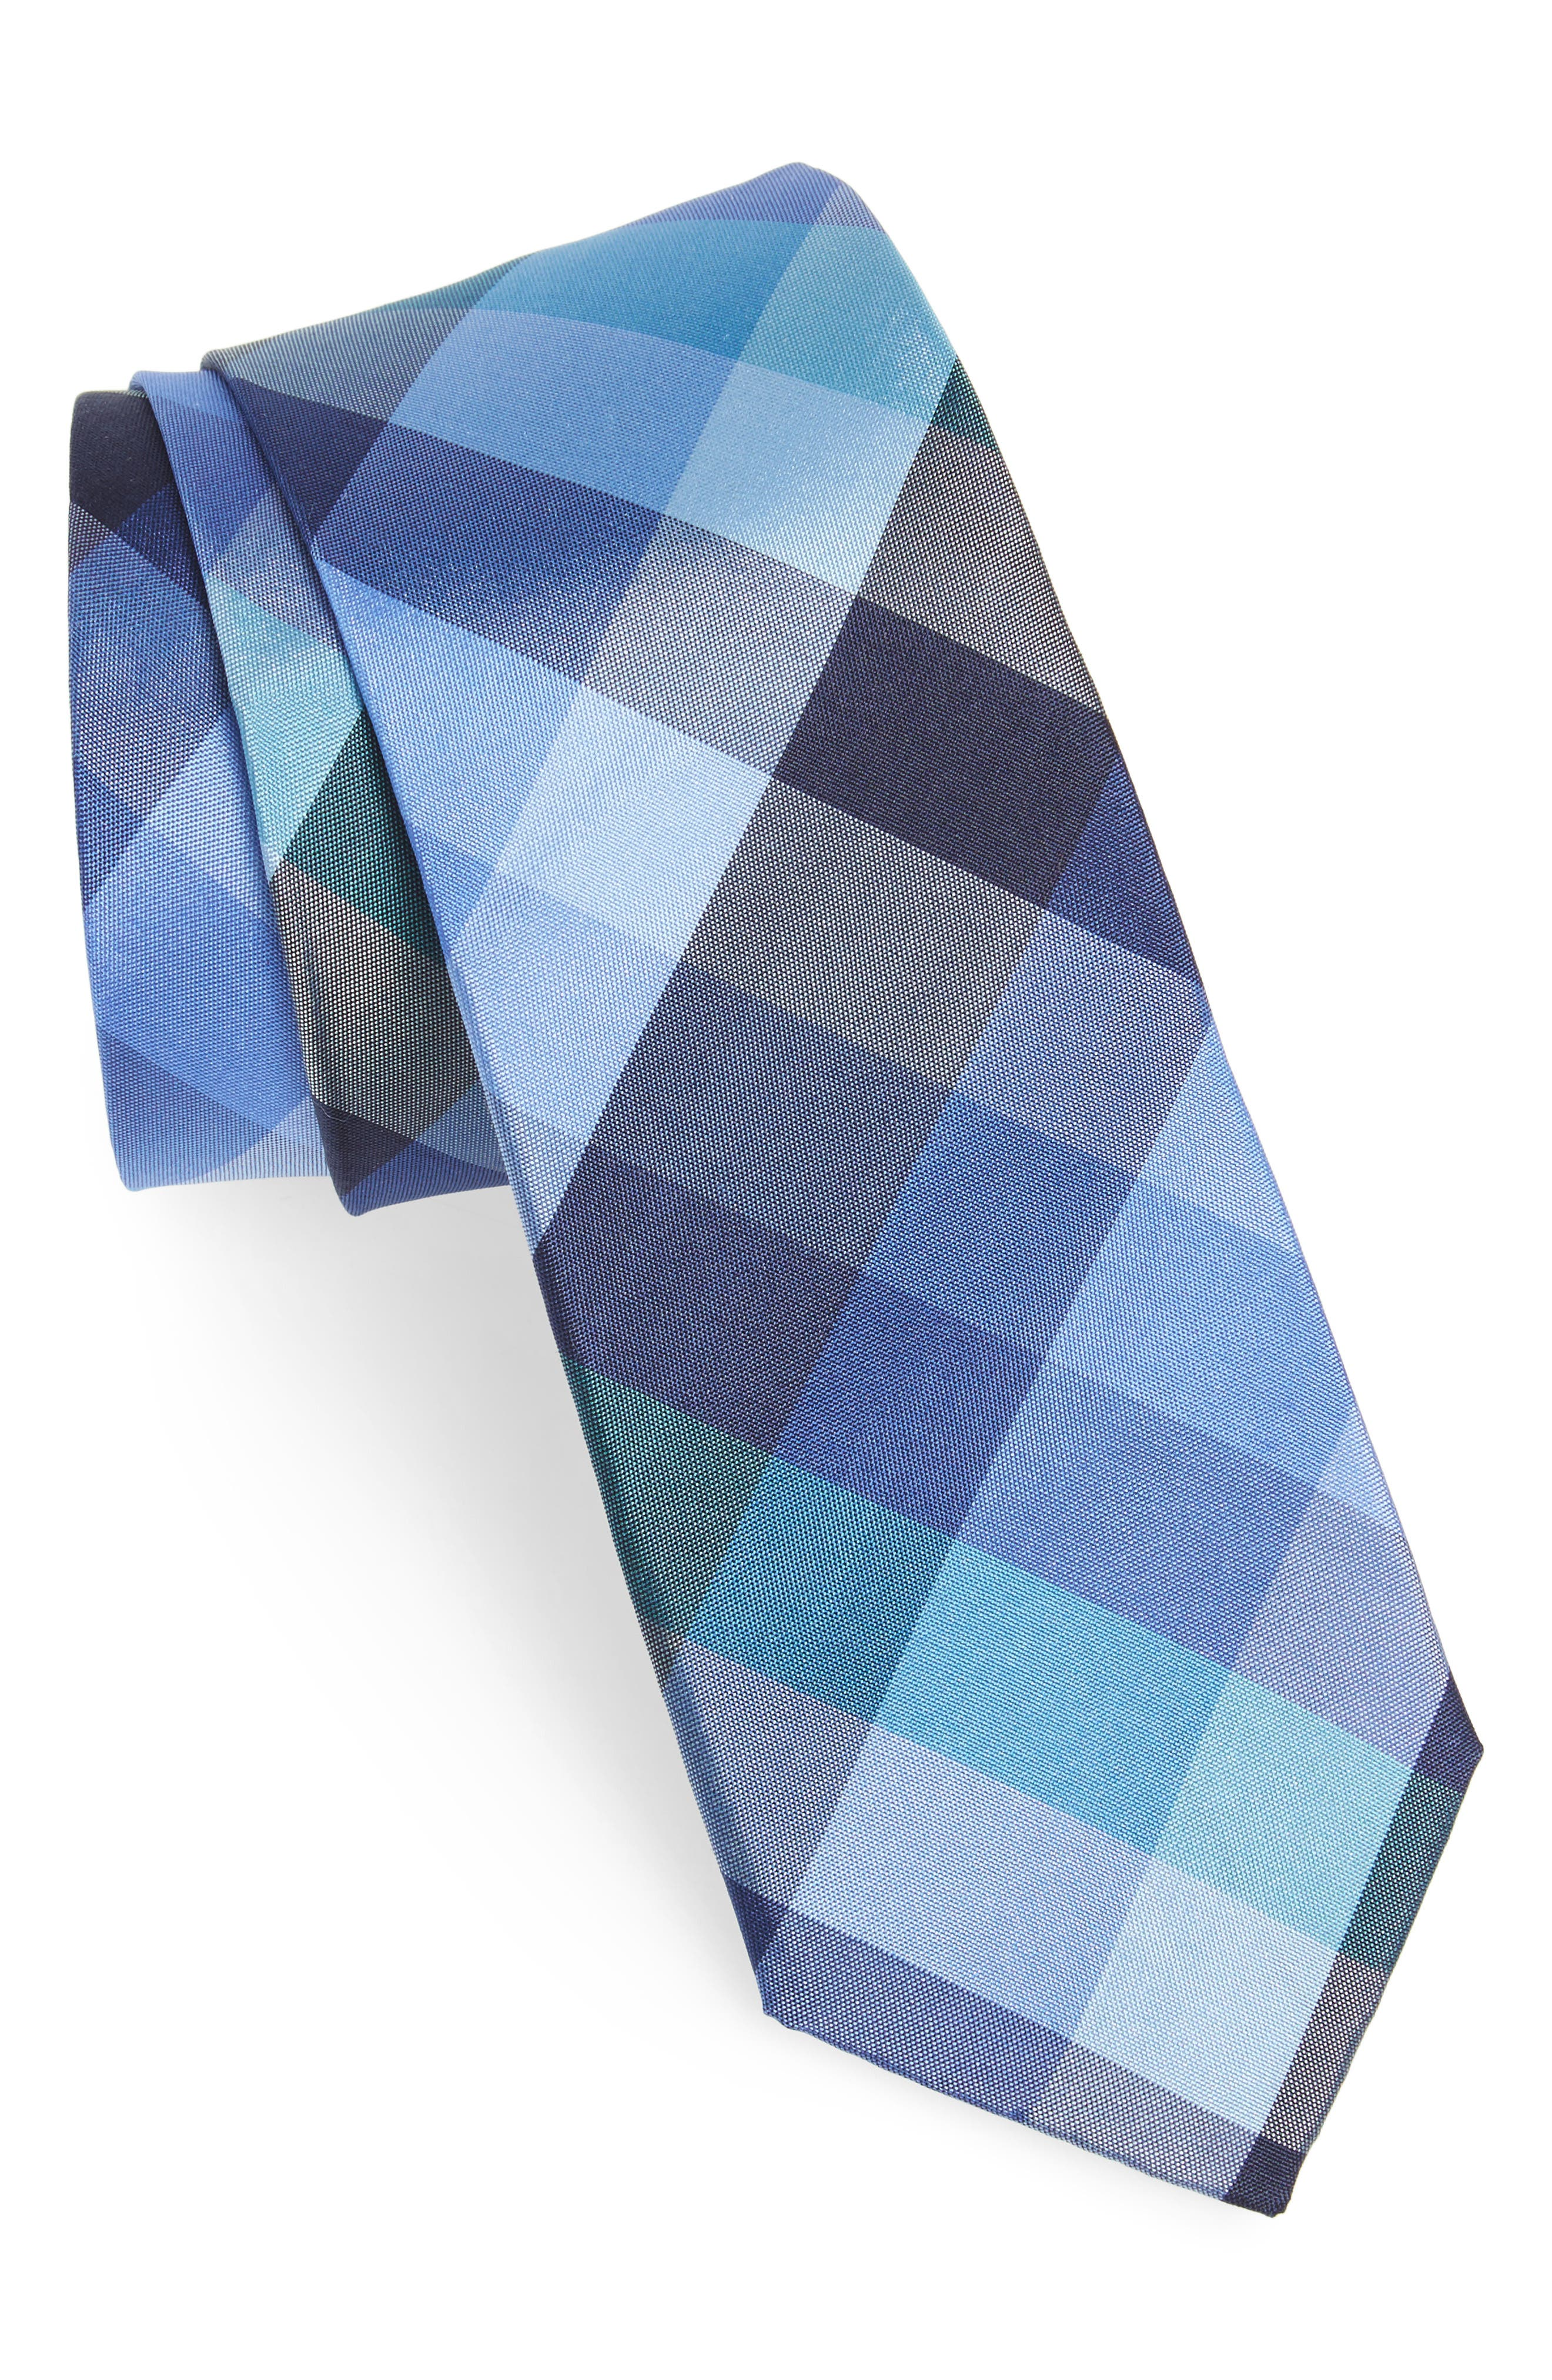 Main Image - Nordstrom Men's Shop Autumn Check Silk Skinny Tie